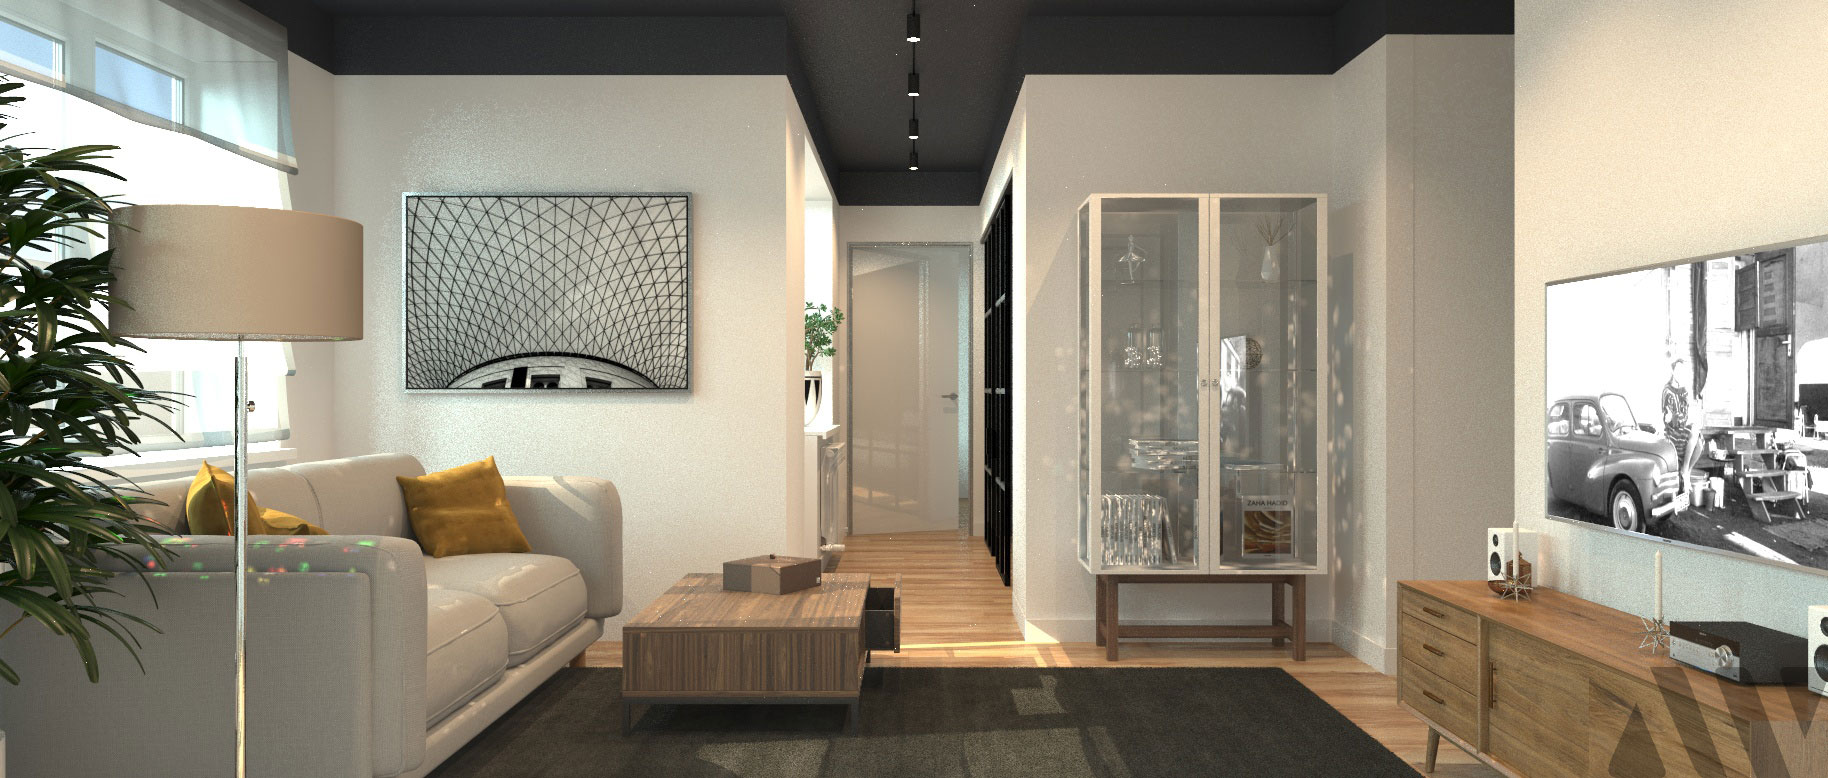 Дизайн и визуализация гостинной комнаты частного дома. фото f_2825f4492e29b8af.jpg